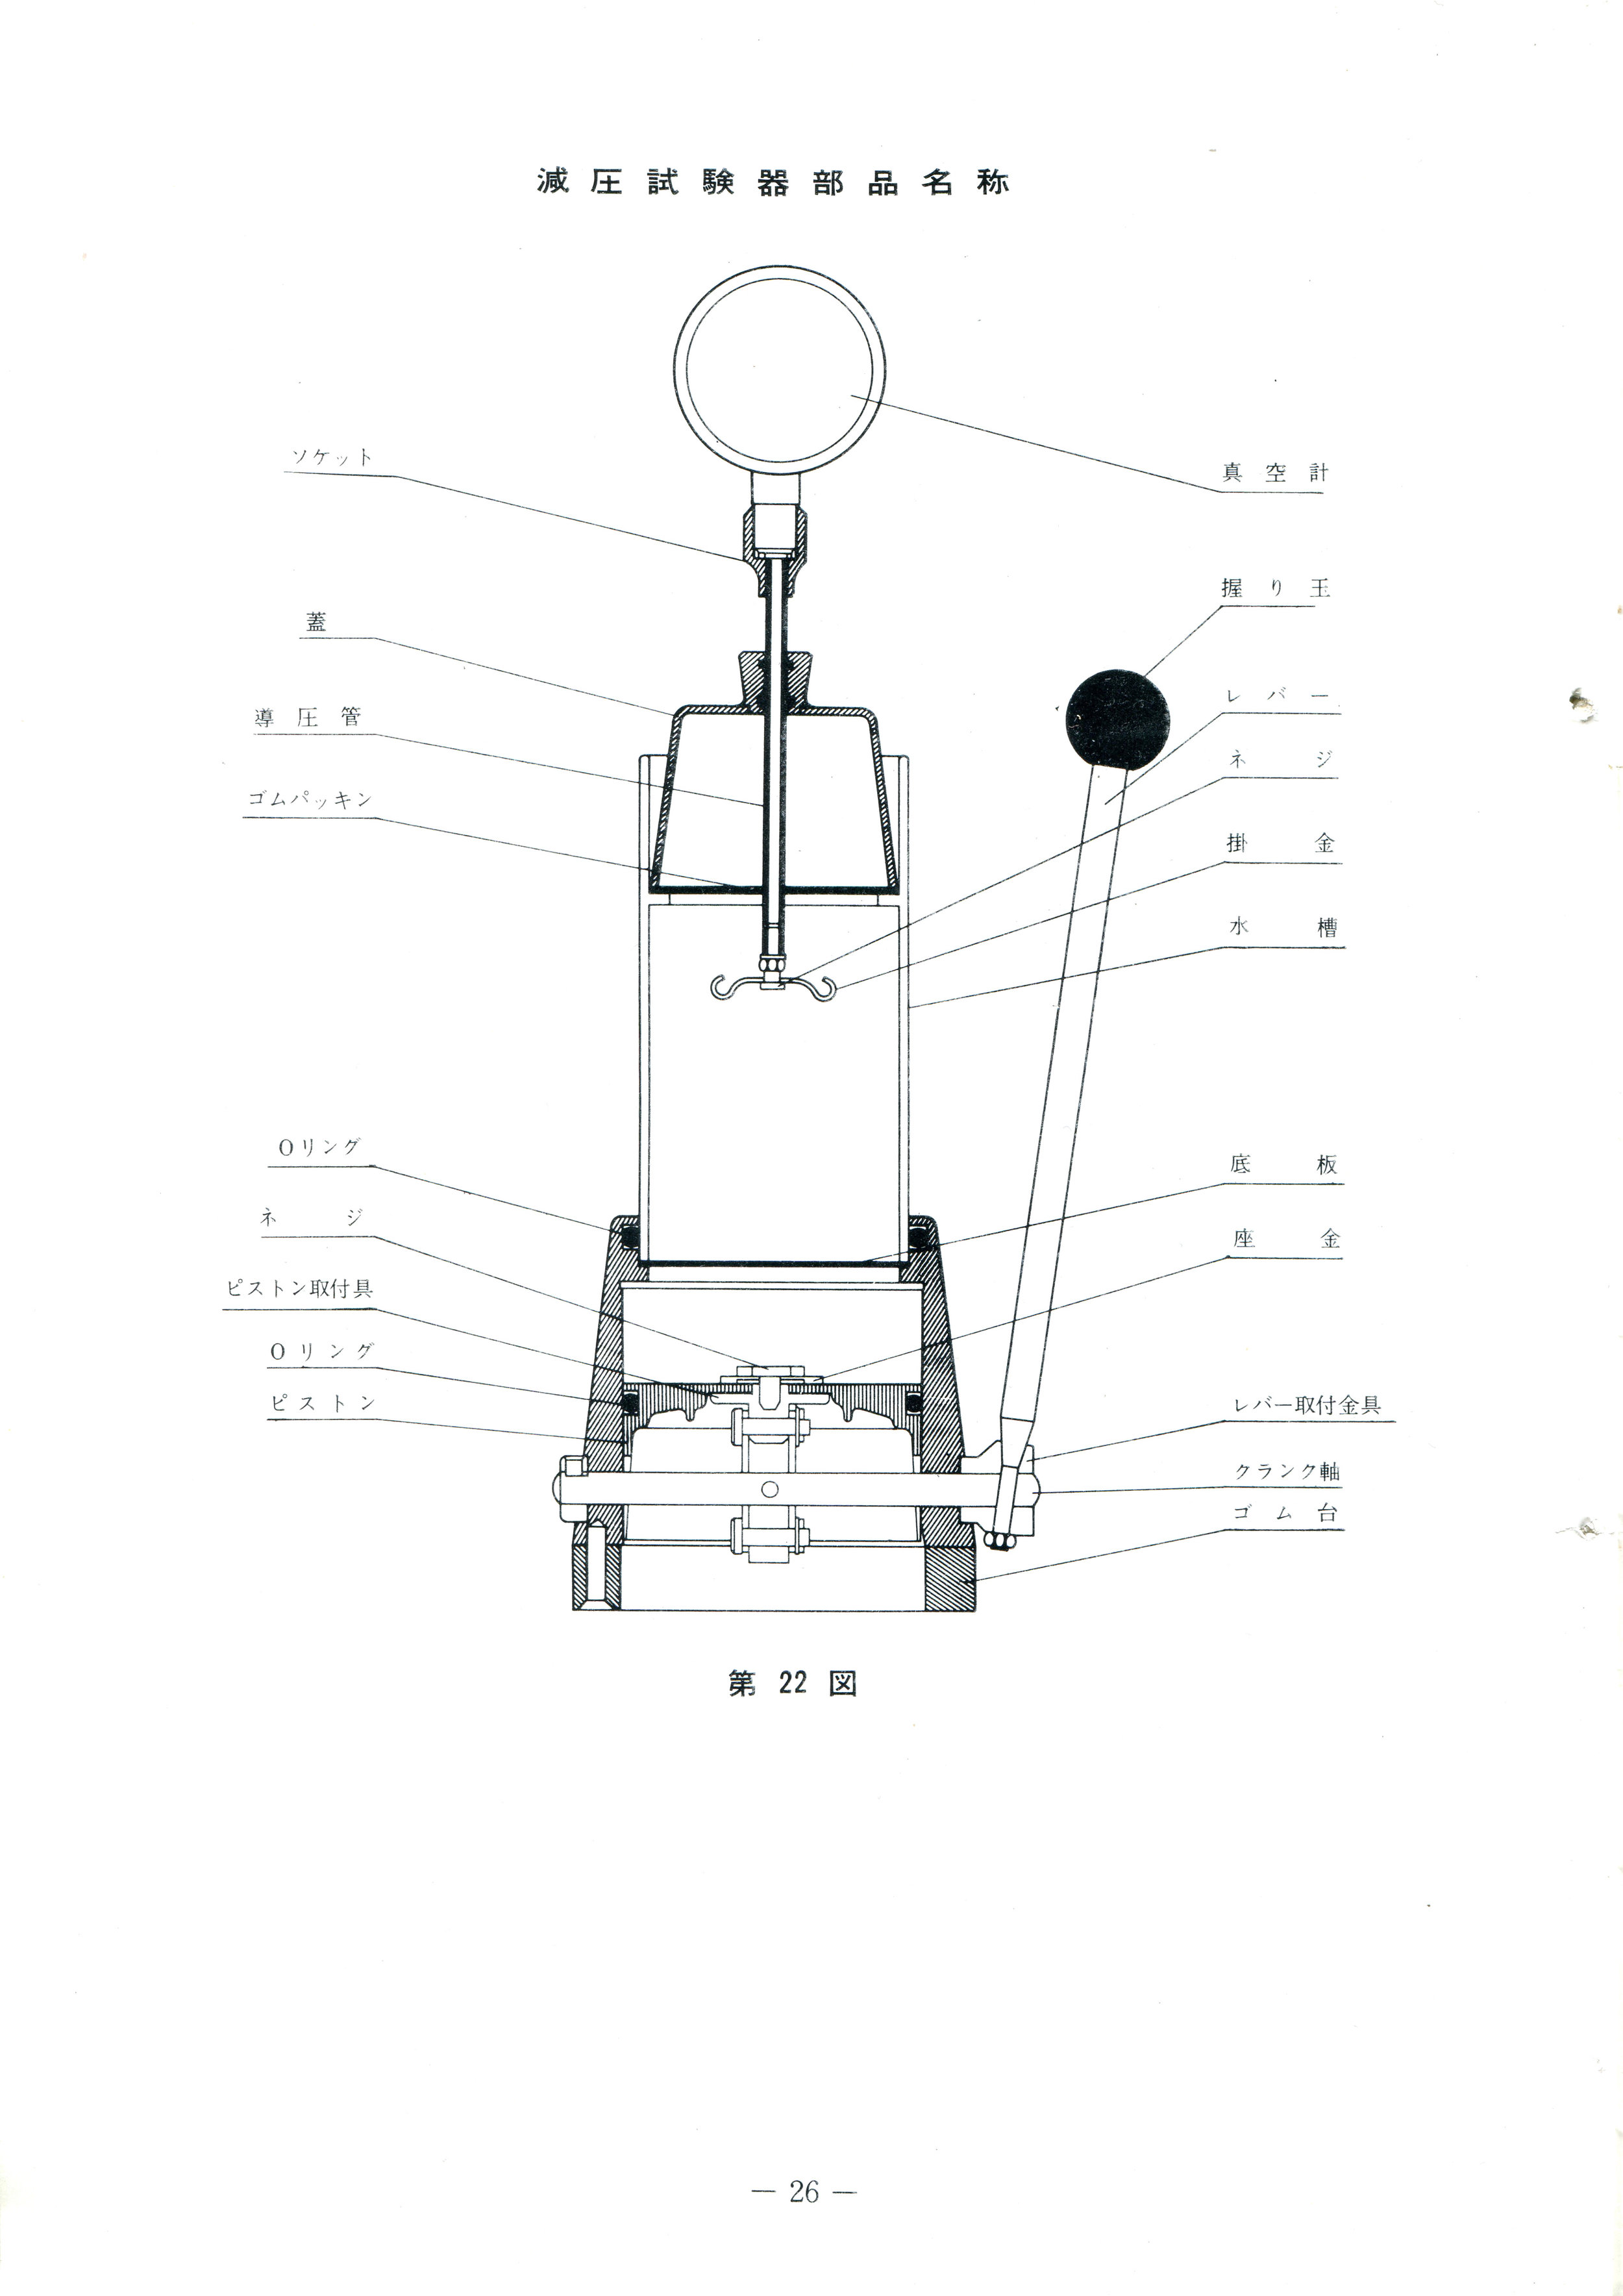 1963 Seiko Technology Notebook - Waterproof (26).jpg